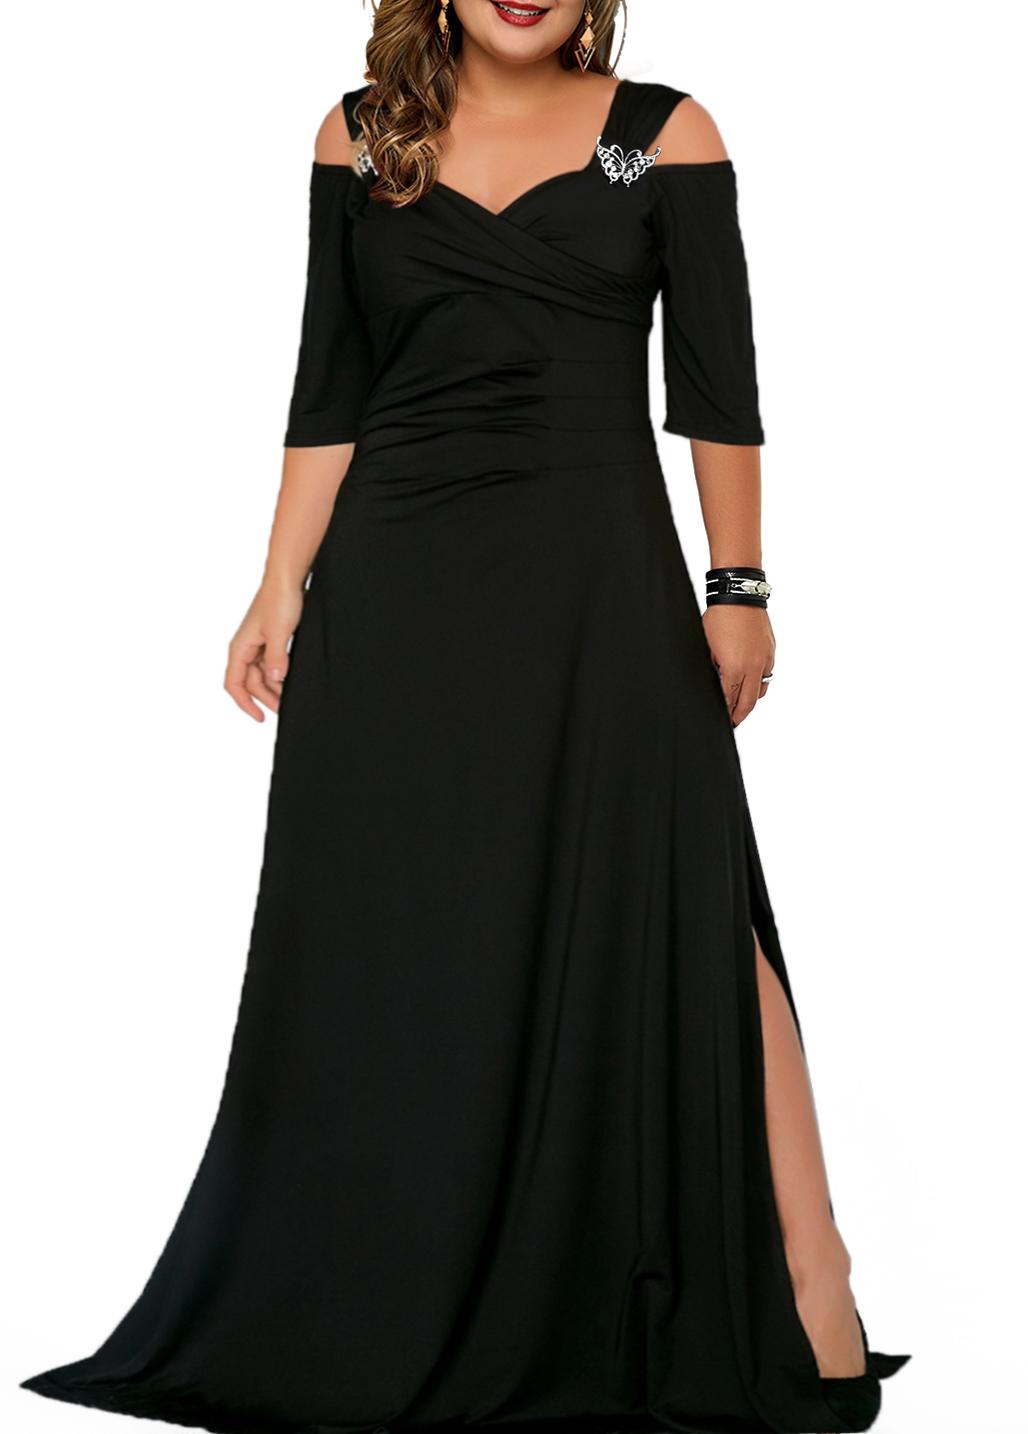 ROTITA Plus Size Cold Shoulder Solid Dress